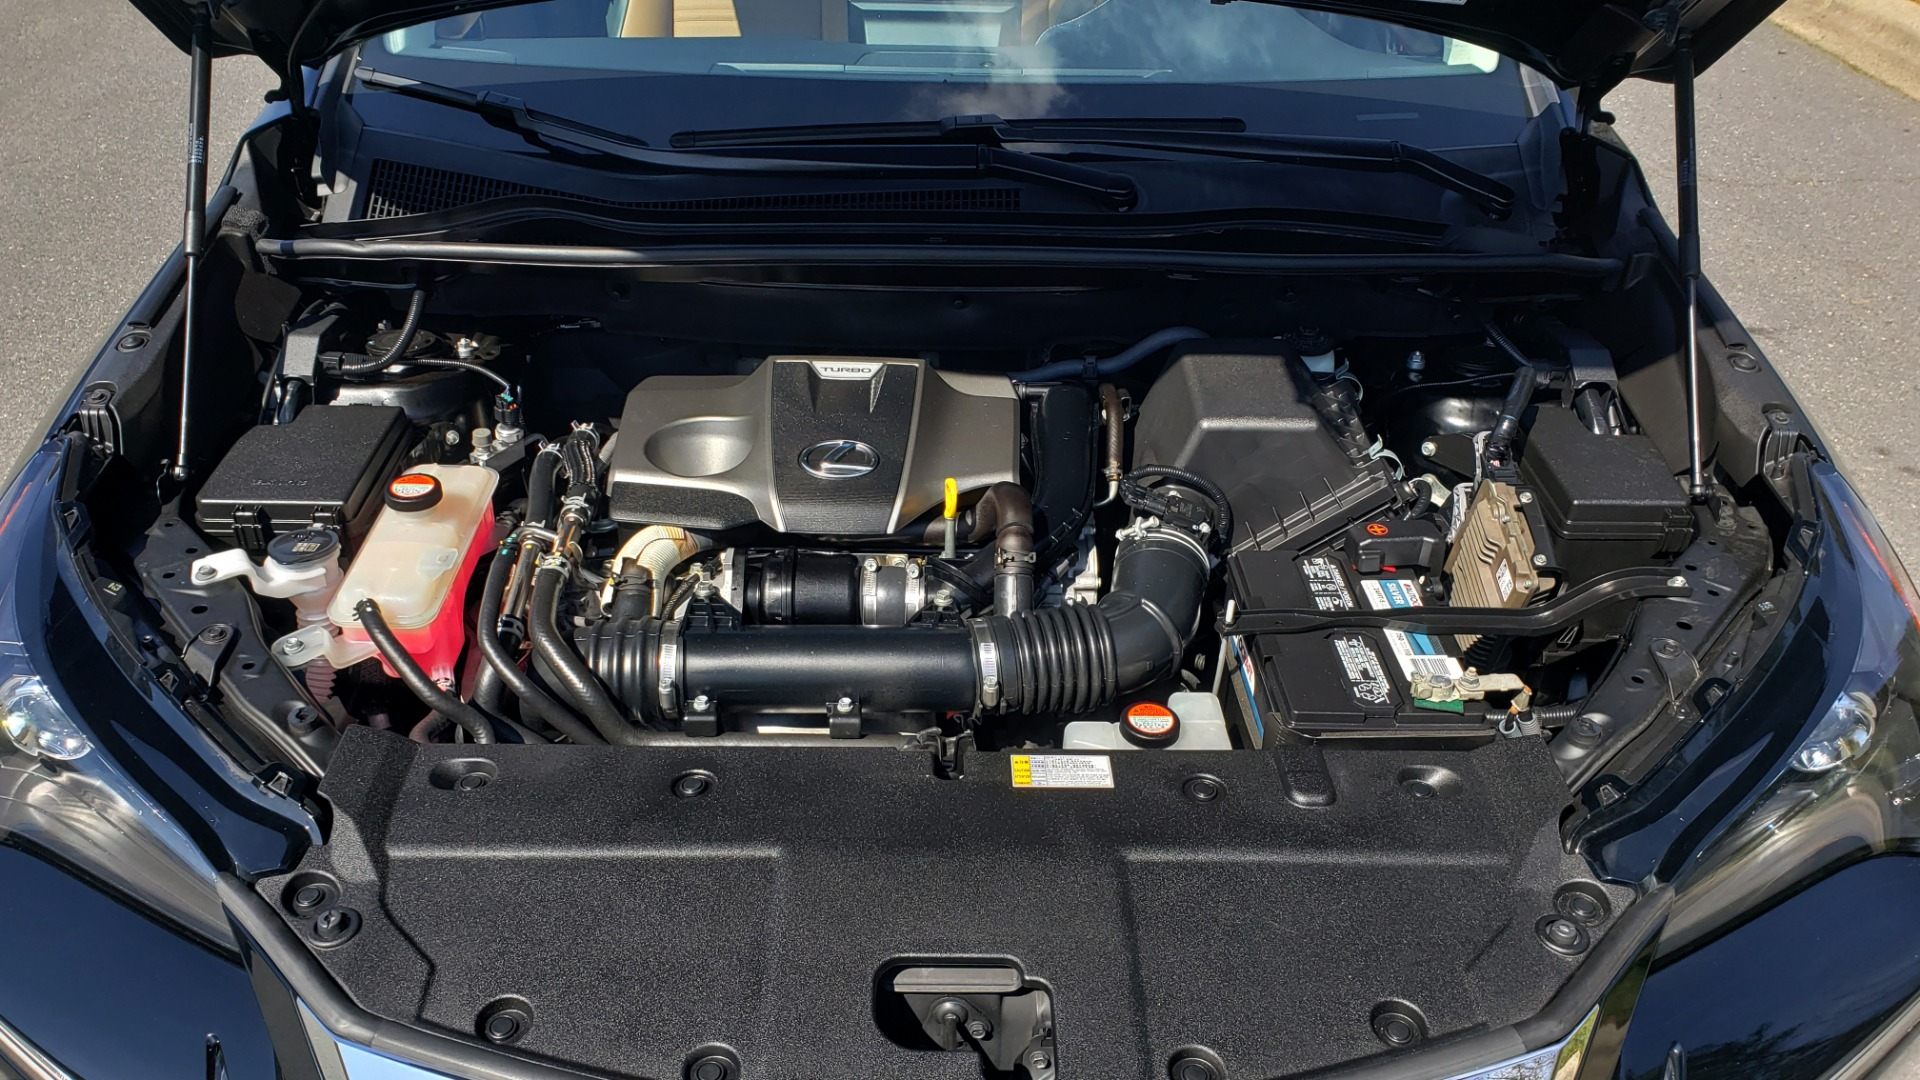 Used 2016 Lexus NX 200T PREM PKG / NAV / SUNROOF / PRE-COLLISION / PARK ASST for sale Sold at Formula Imports in Charlotte NC 28227 10